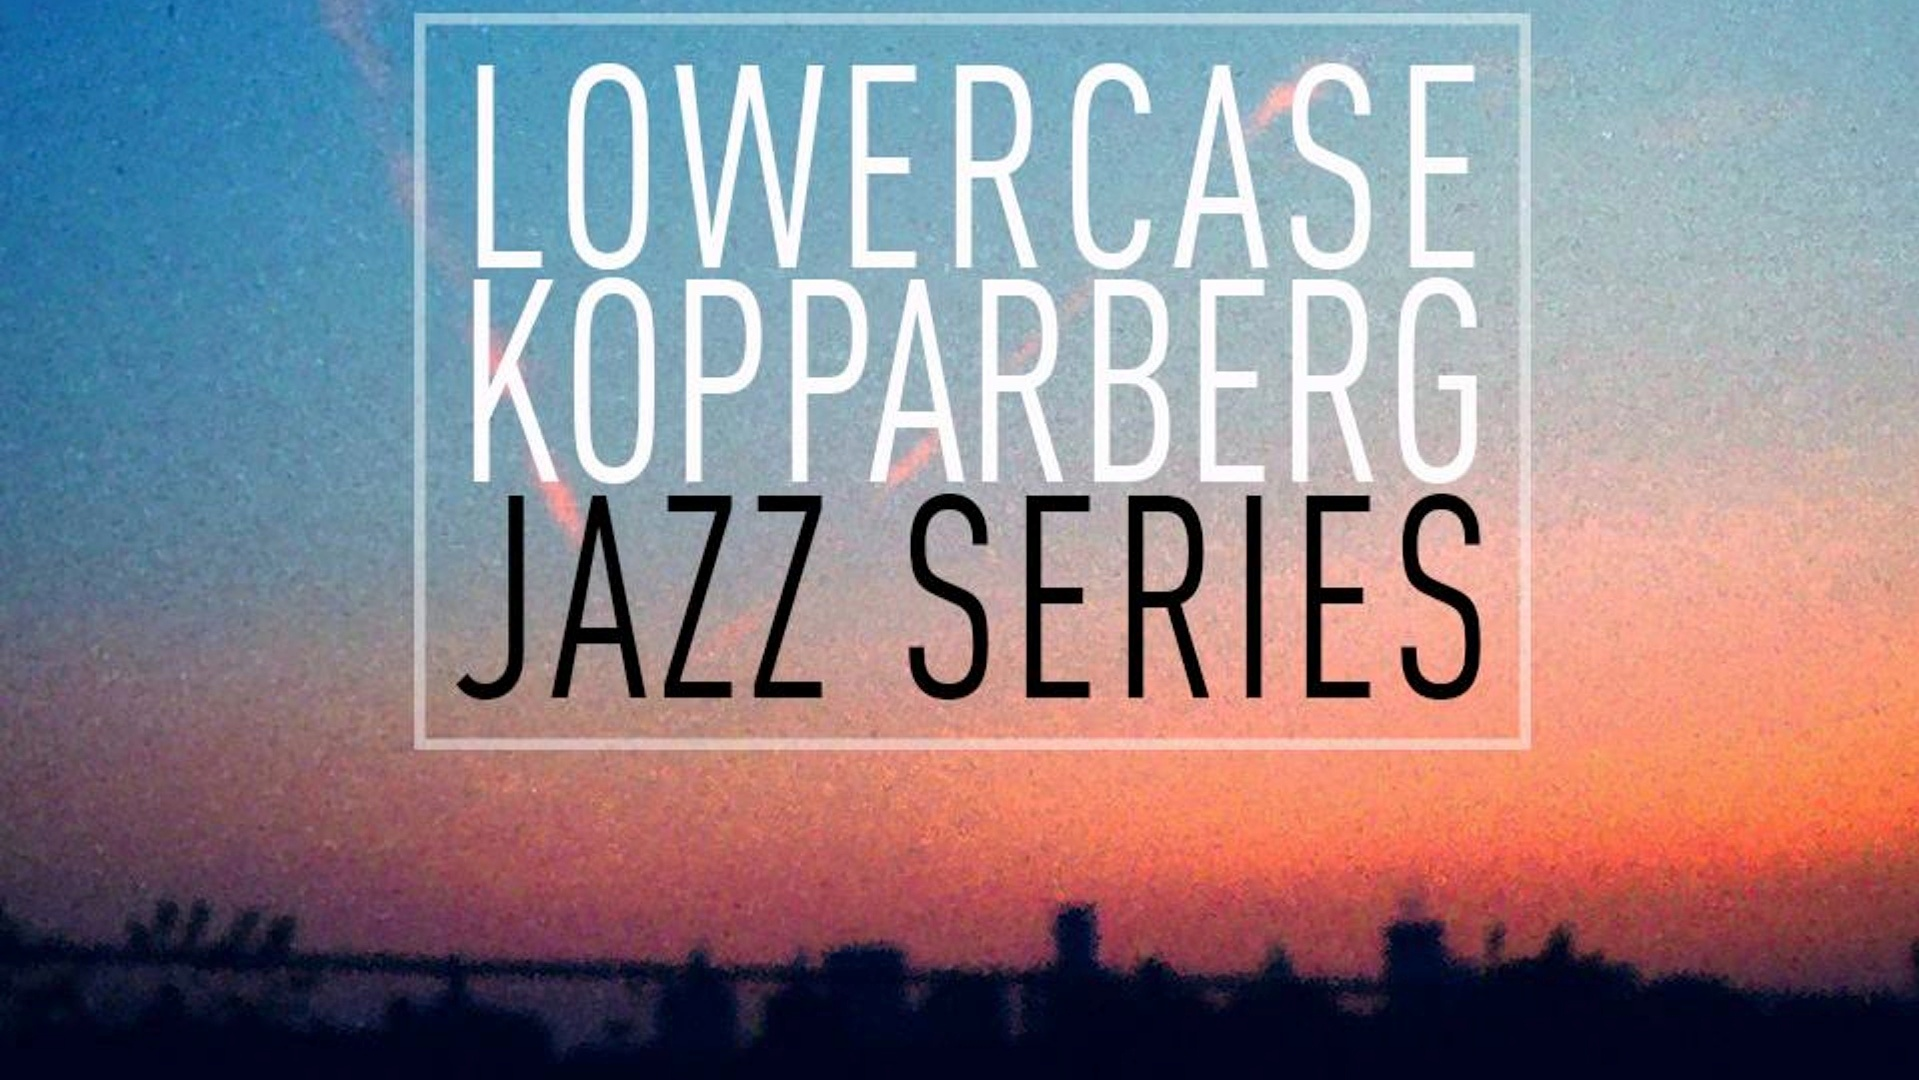 Lowercase Koppaberg Jazz Series #4